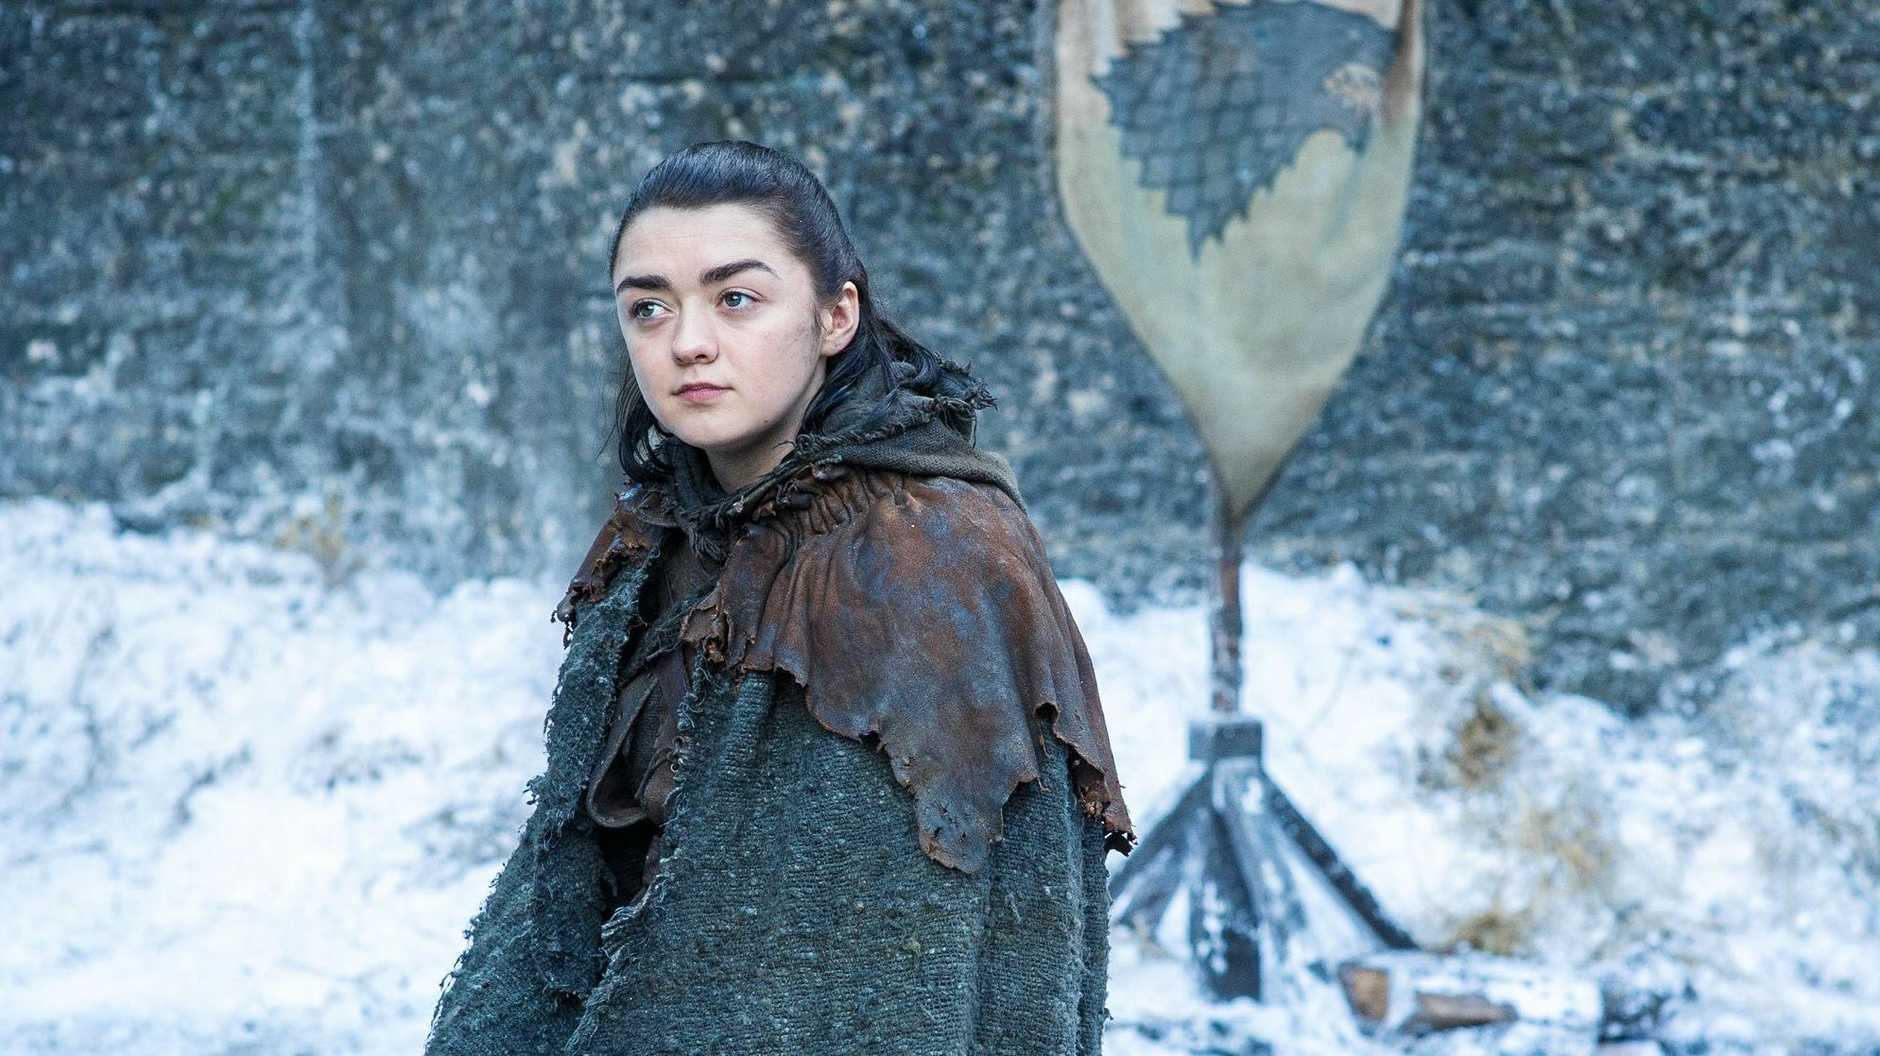 Maisie Williams returns as Arya Stark in the final season of Game of Thrones.